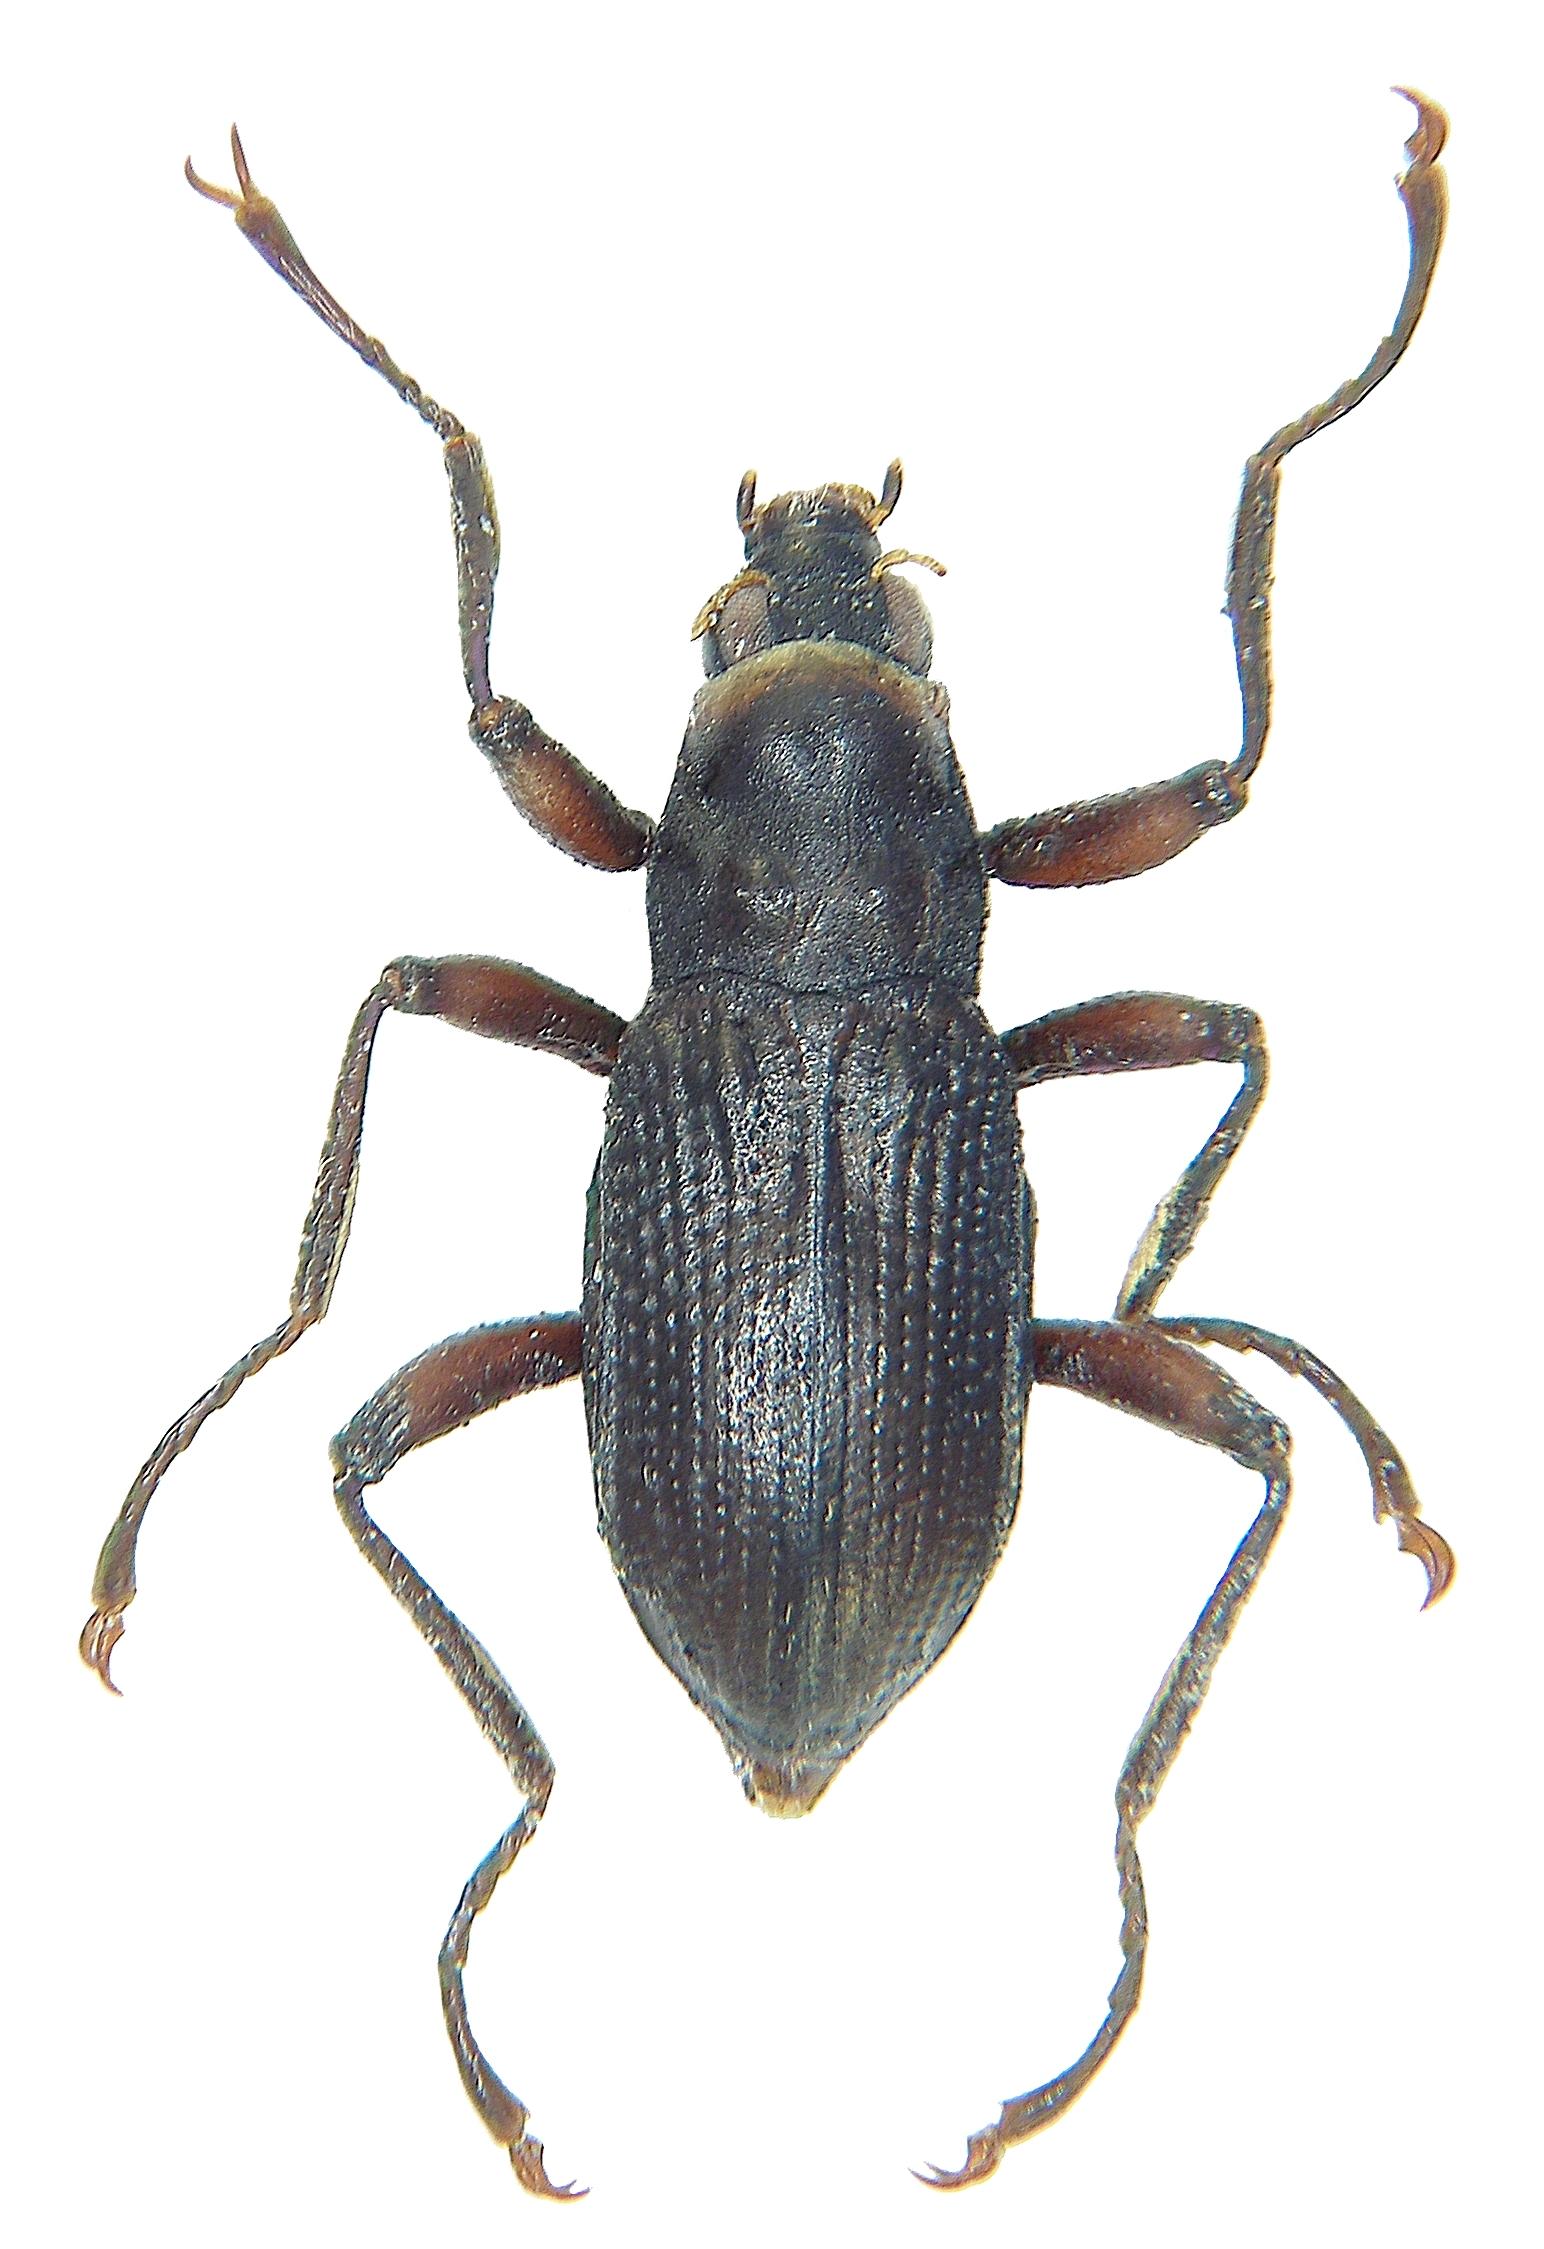 Fiche espèce : Macronychus quadrituberculatus Müller, 1806 – Artoise.